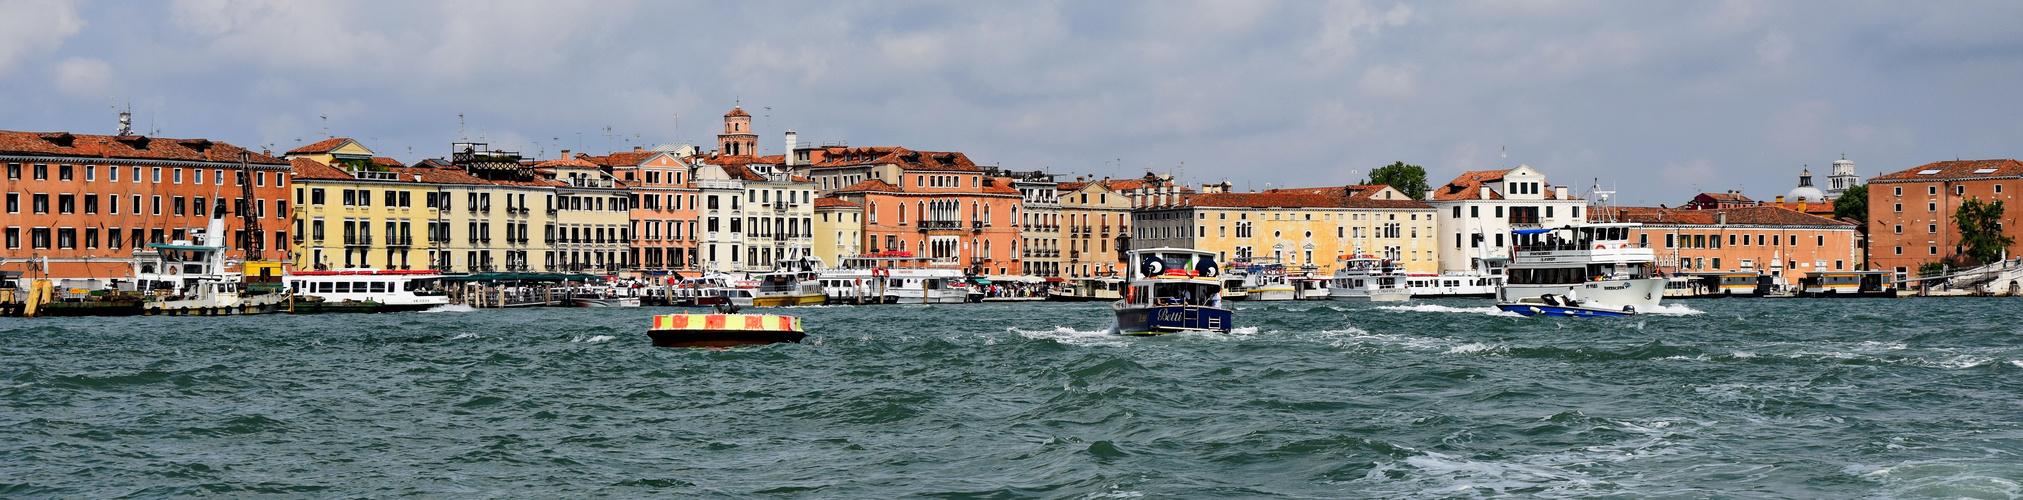 Venedigpanorama